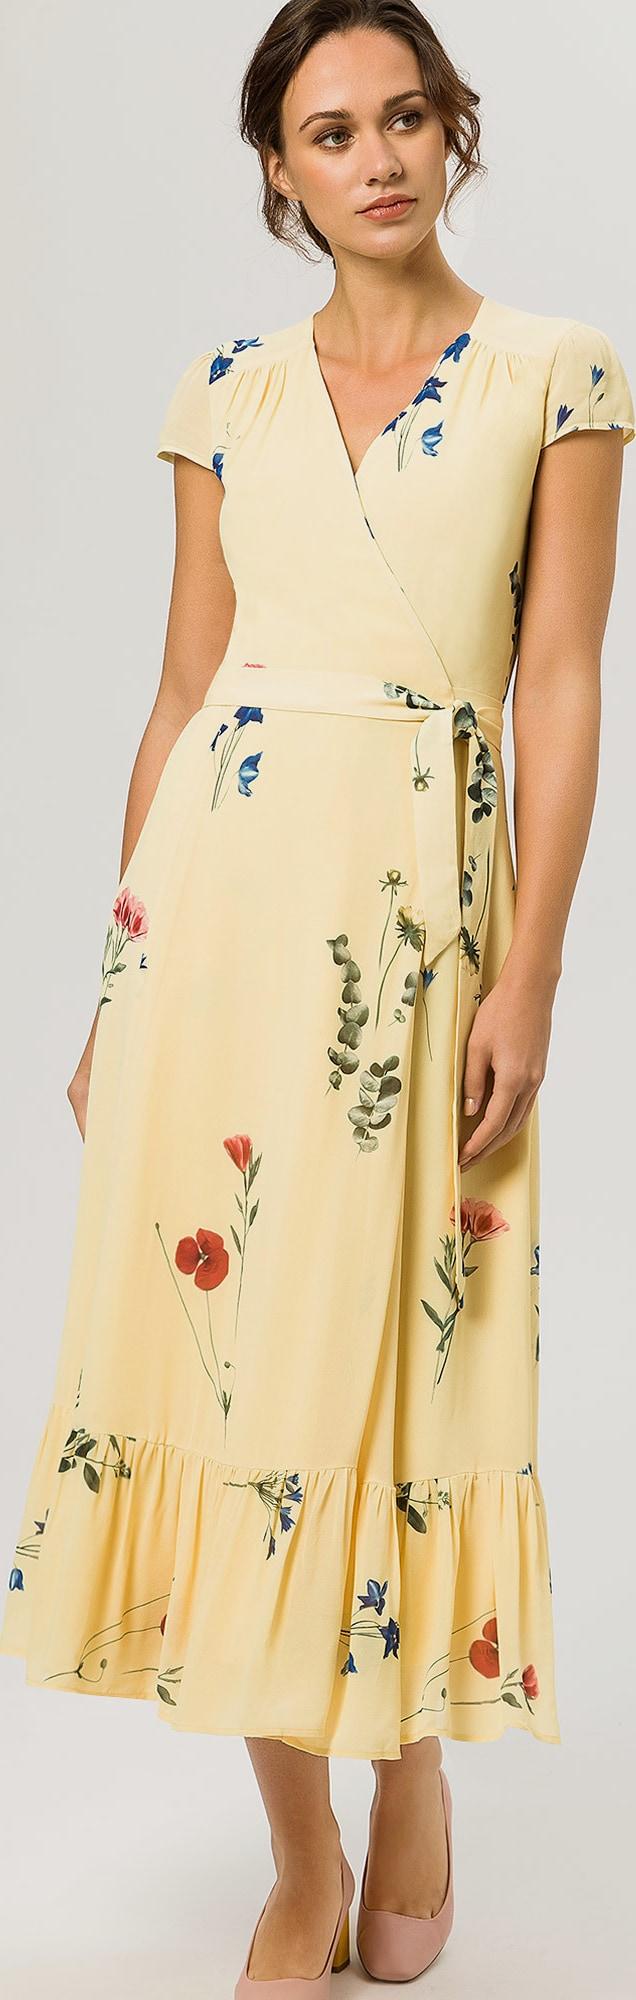 ivy oak kleider wrap dress cap sleeve volant gelb in gelb about you. Black Bedroom Furniture Sets. Home Design Ideas